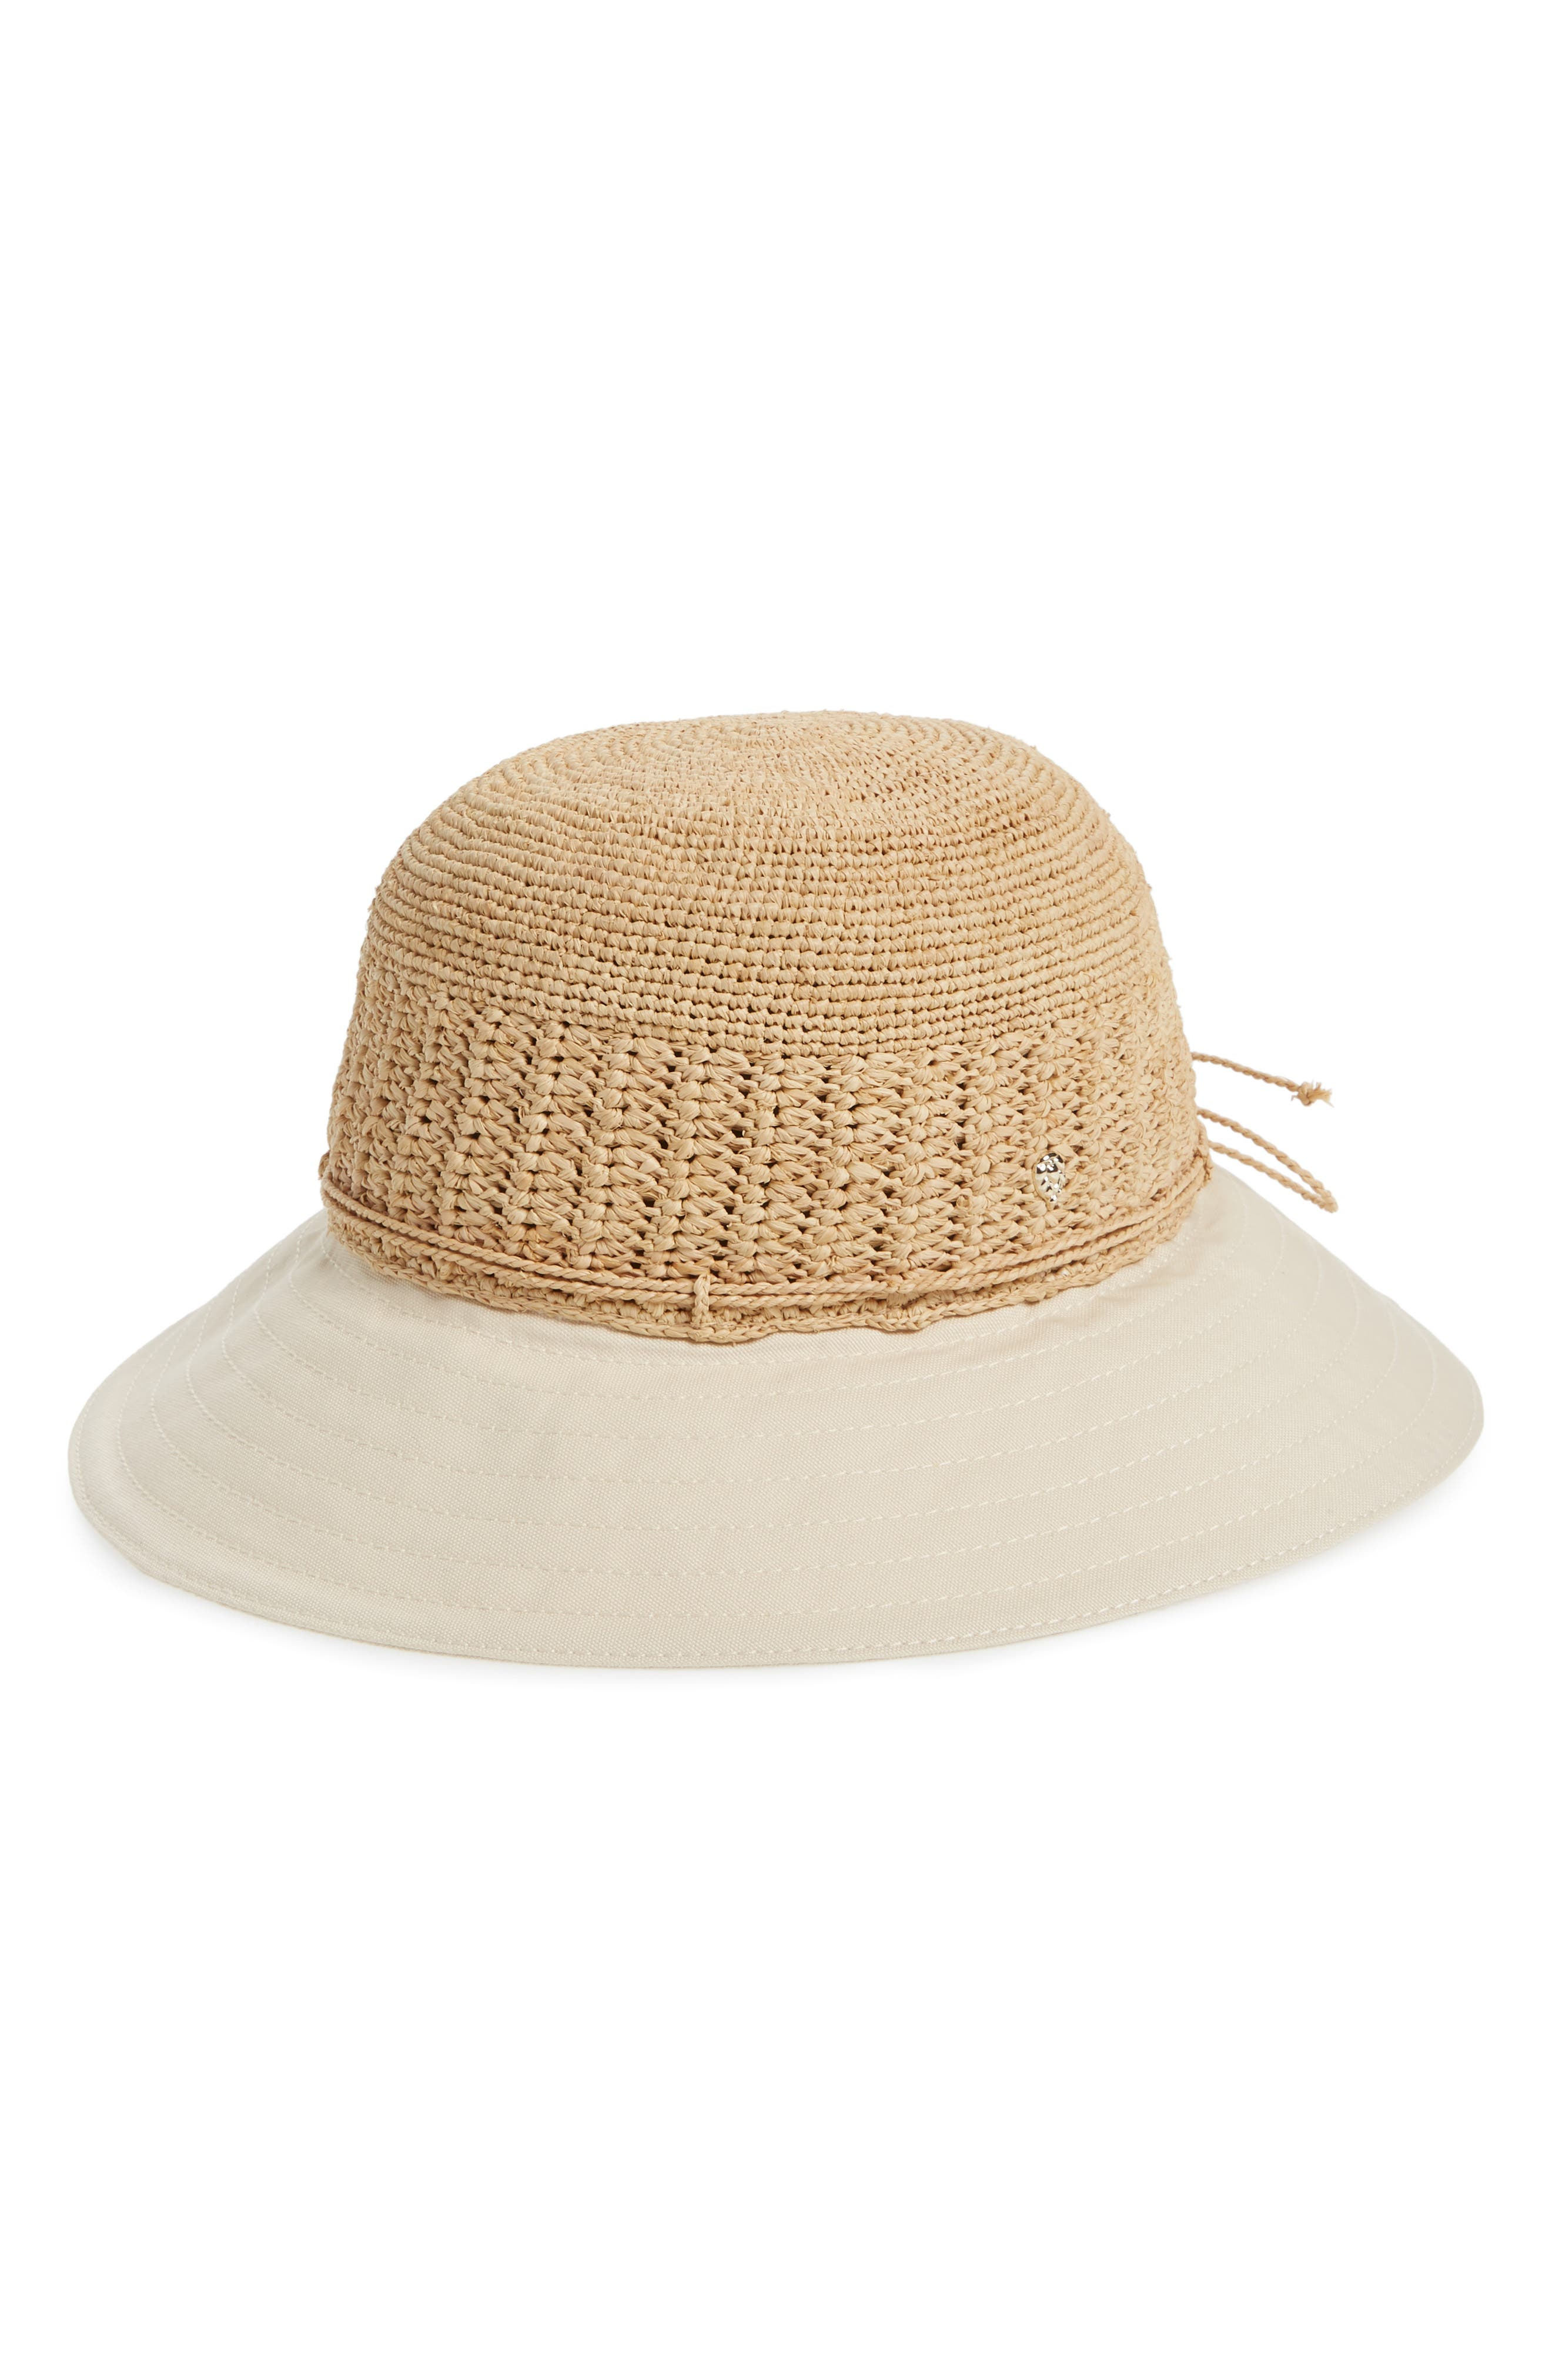 Cotton Brim Raffia Hat,                             Main thumbnail 1, color,                             Natural/ Shell